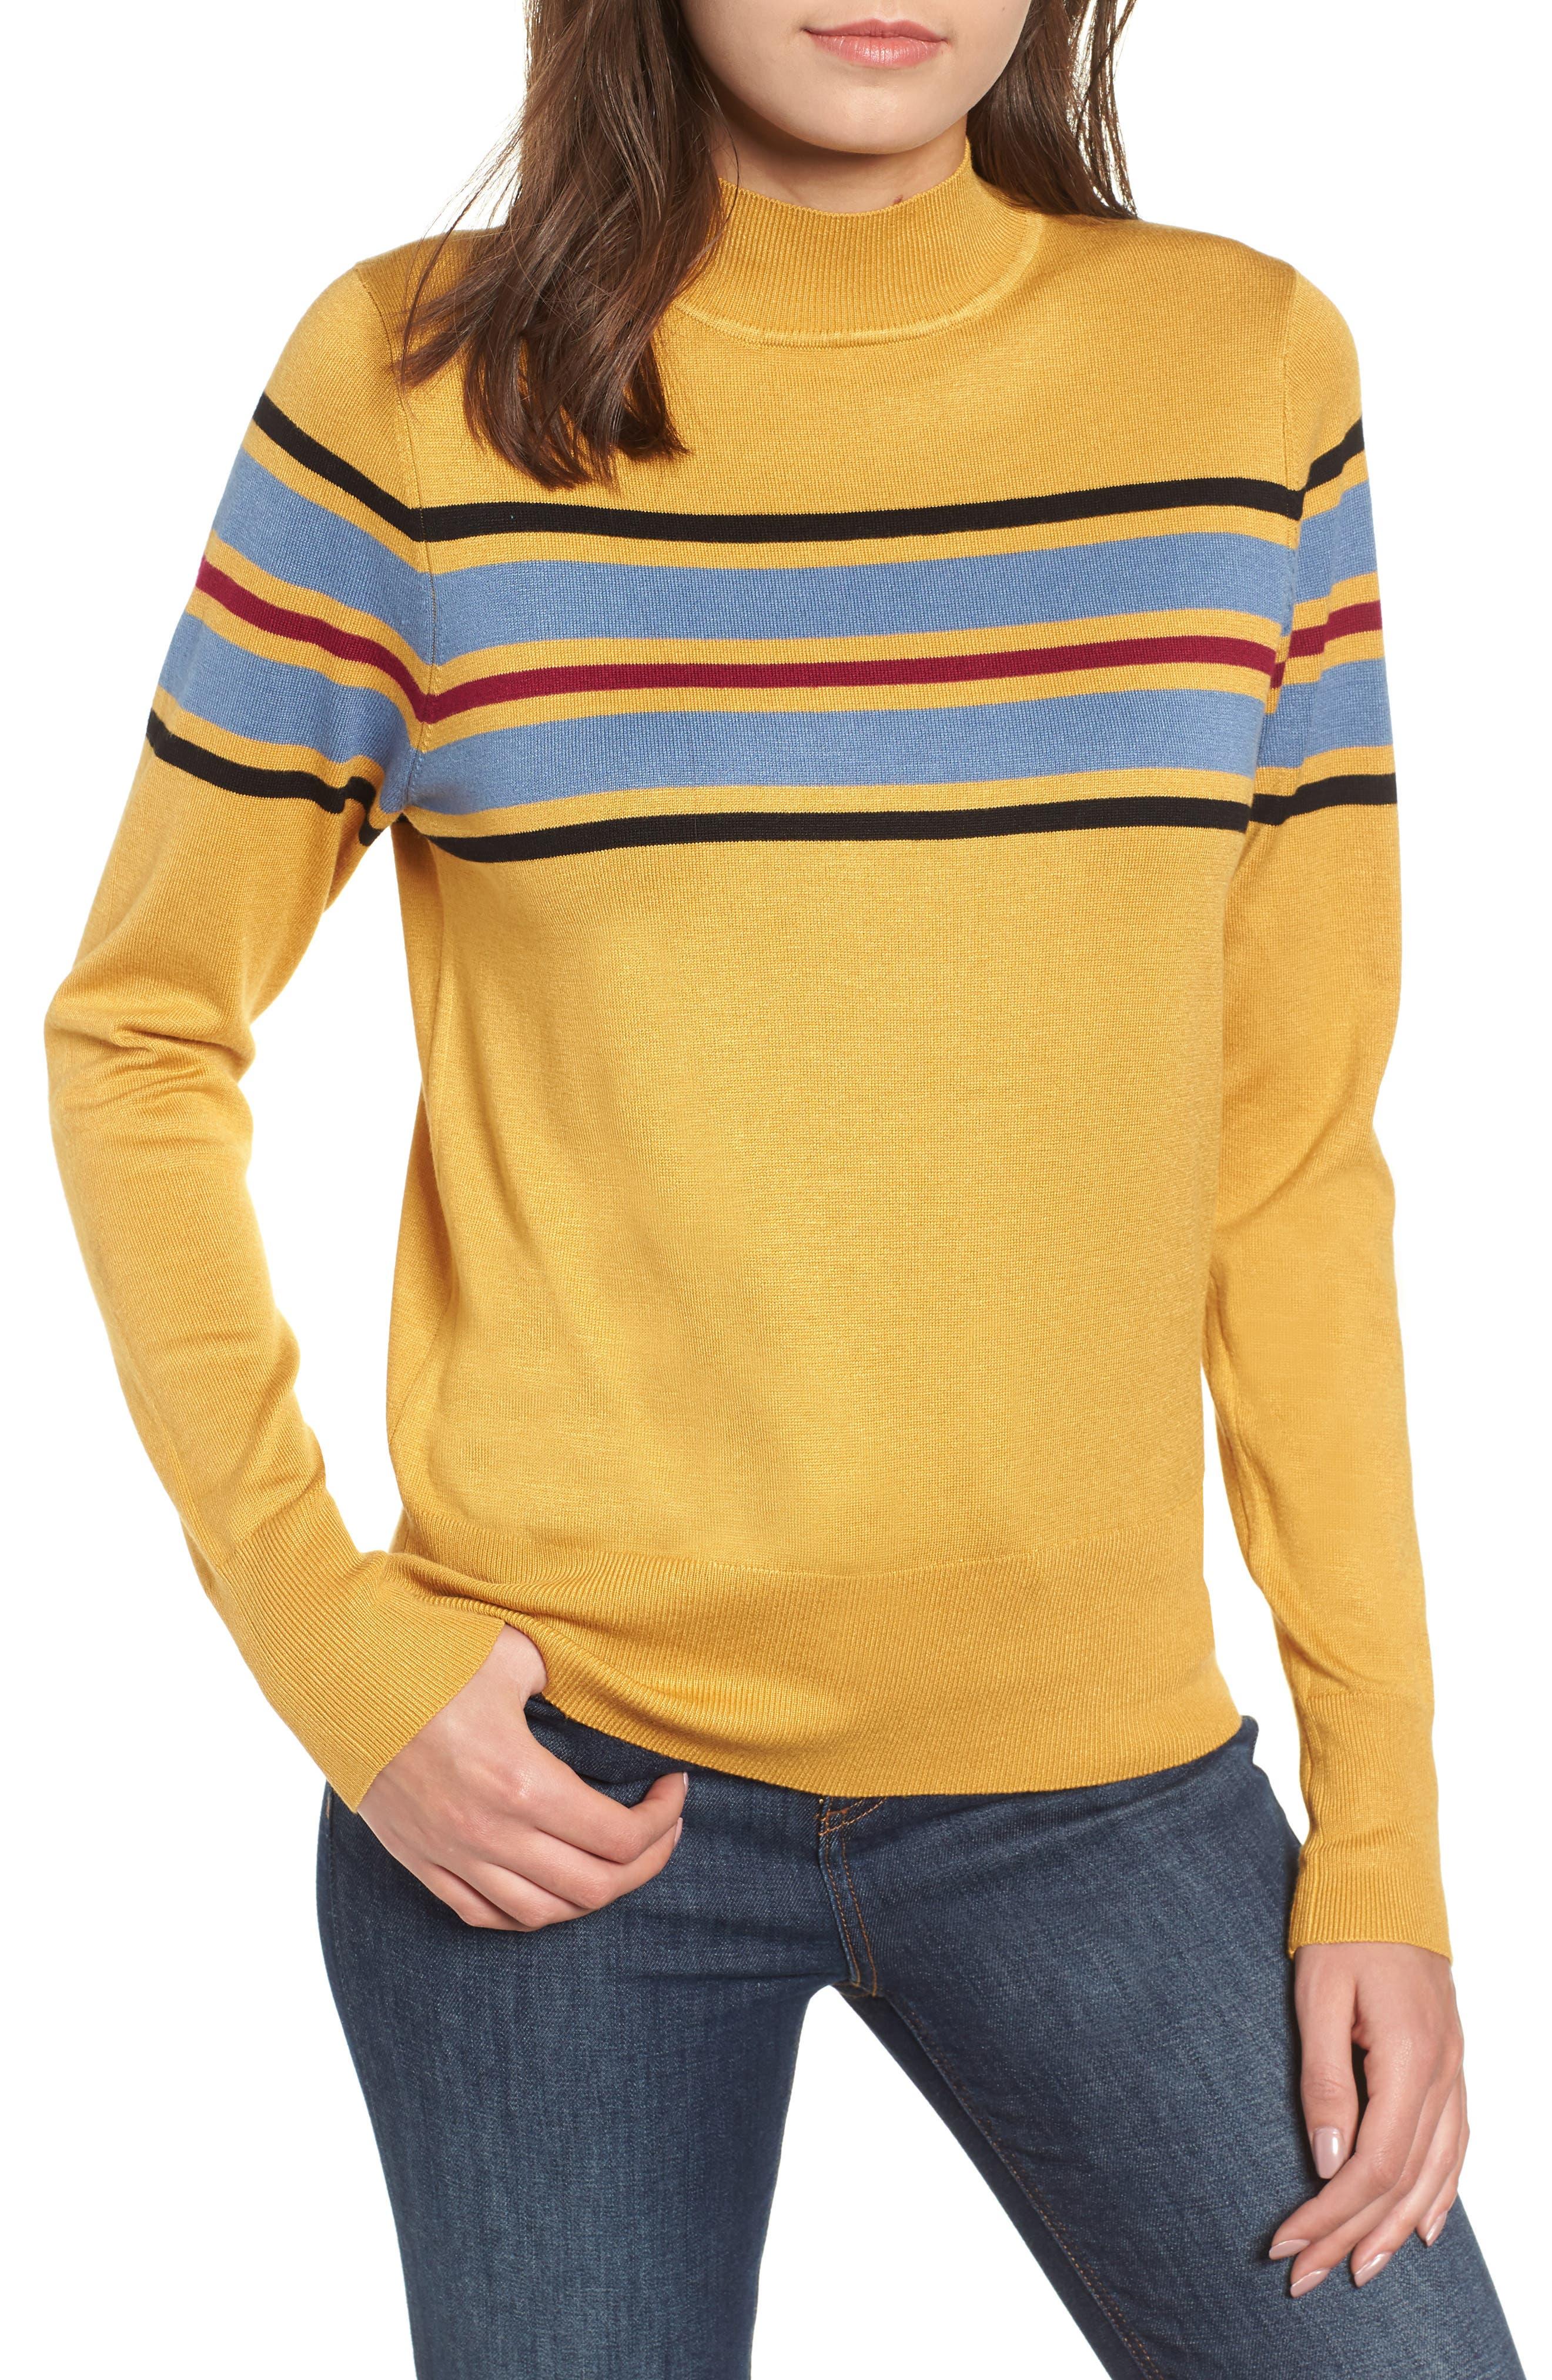 Skivvy Stripe Sweater,                             Main thumbnail 1, color,                             MUSTARD